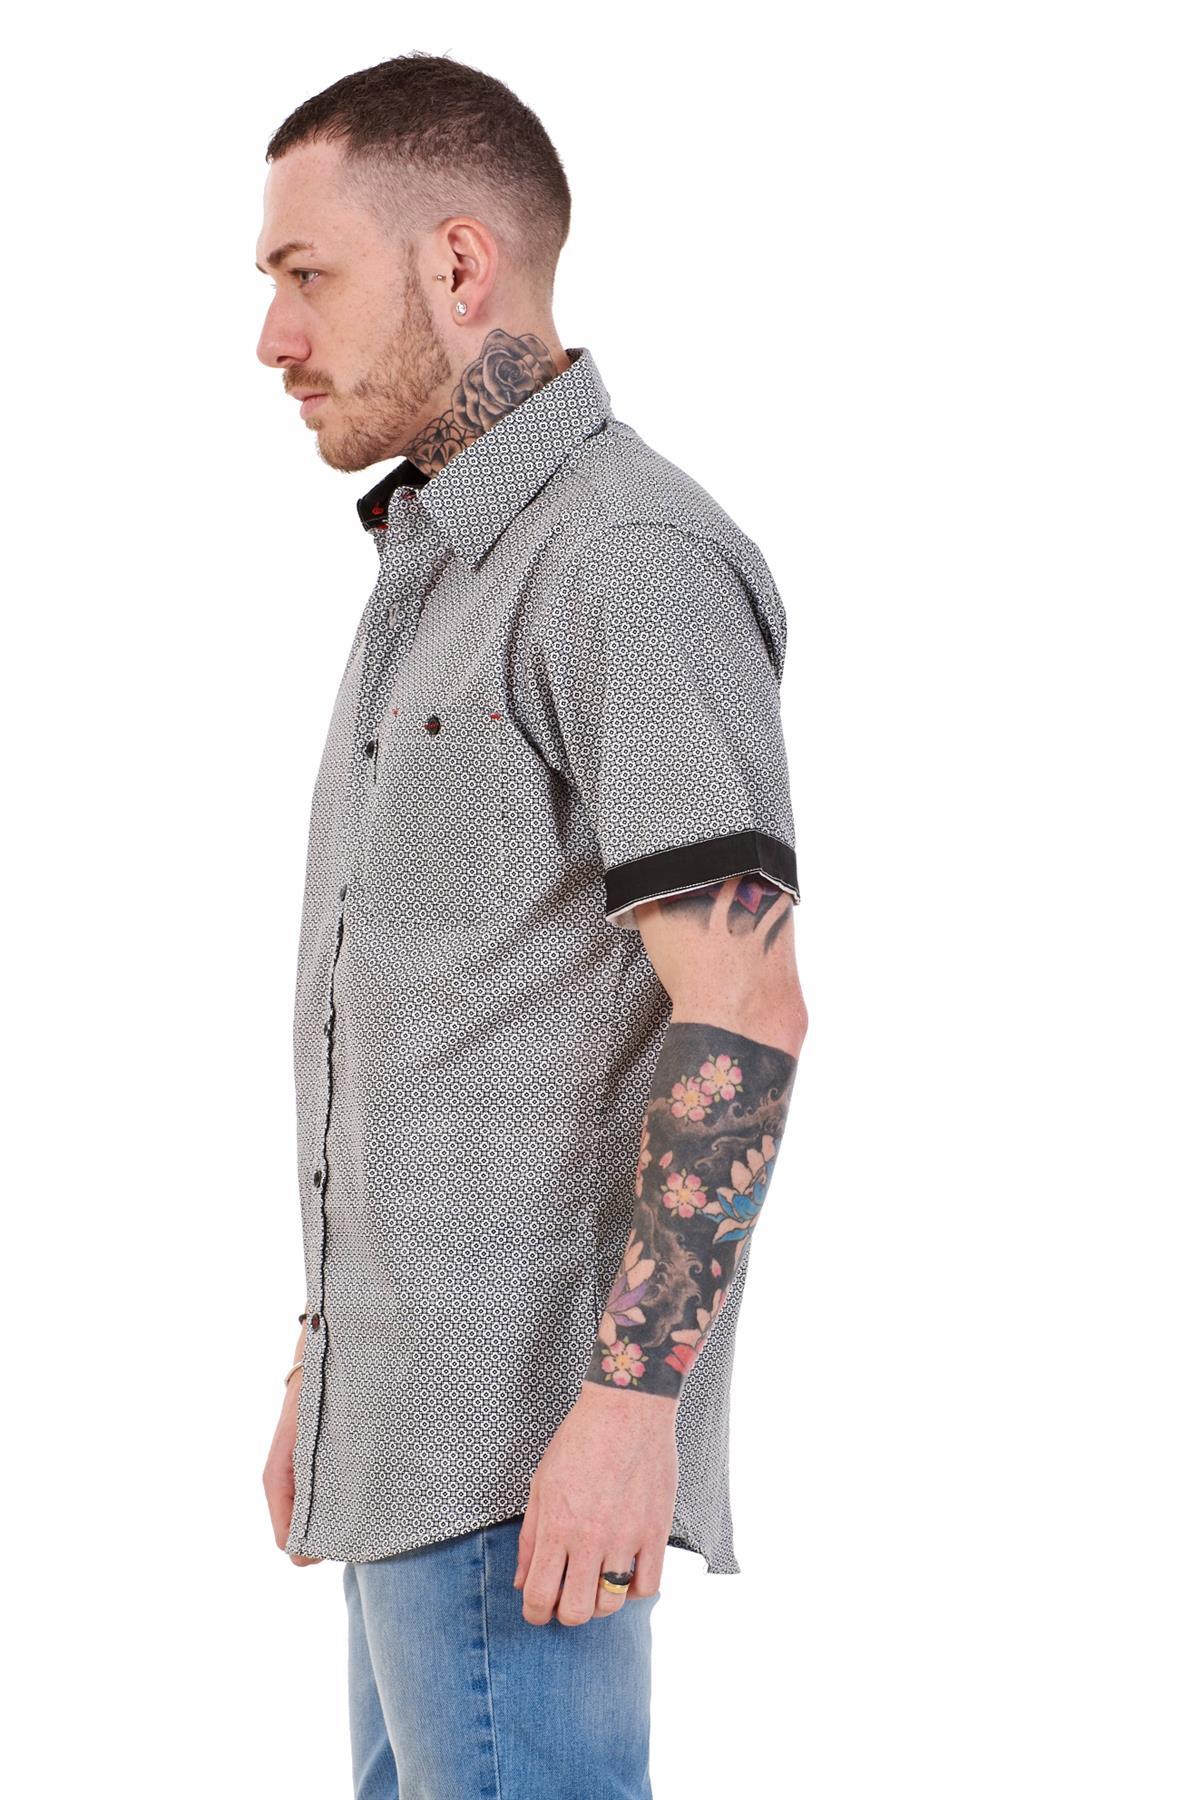 Mens-100-Cotton-Printed-Shirt-Short-Sleeve-Regular-Big-Size-Casual-Top-M-to-5XL thumbnail 9